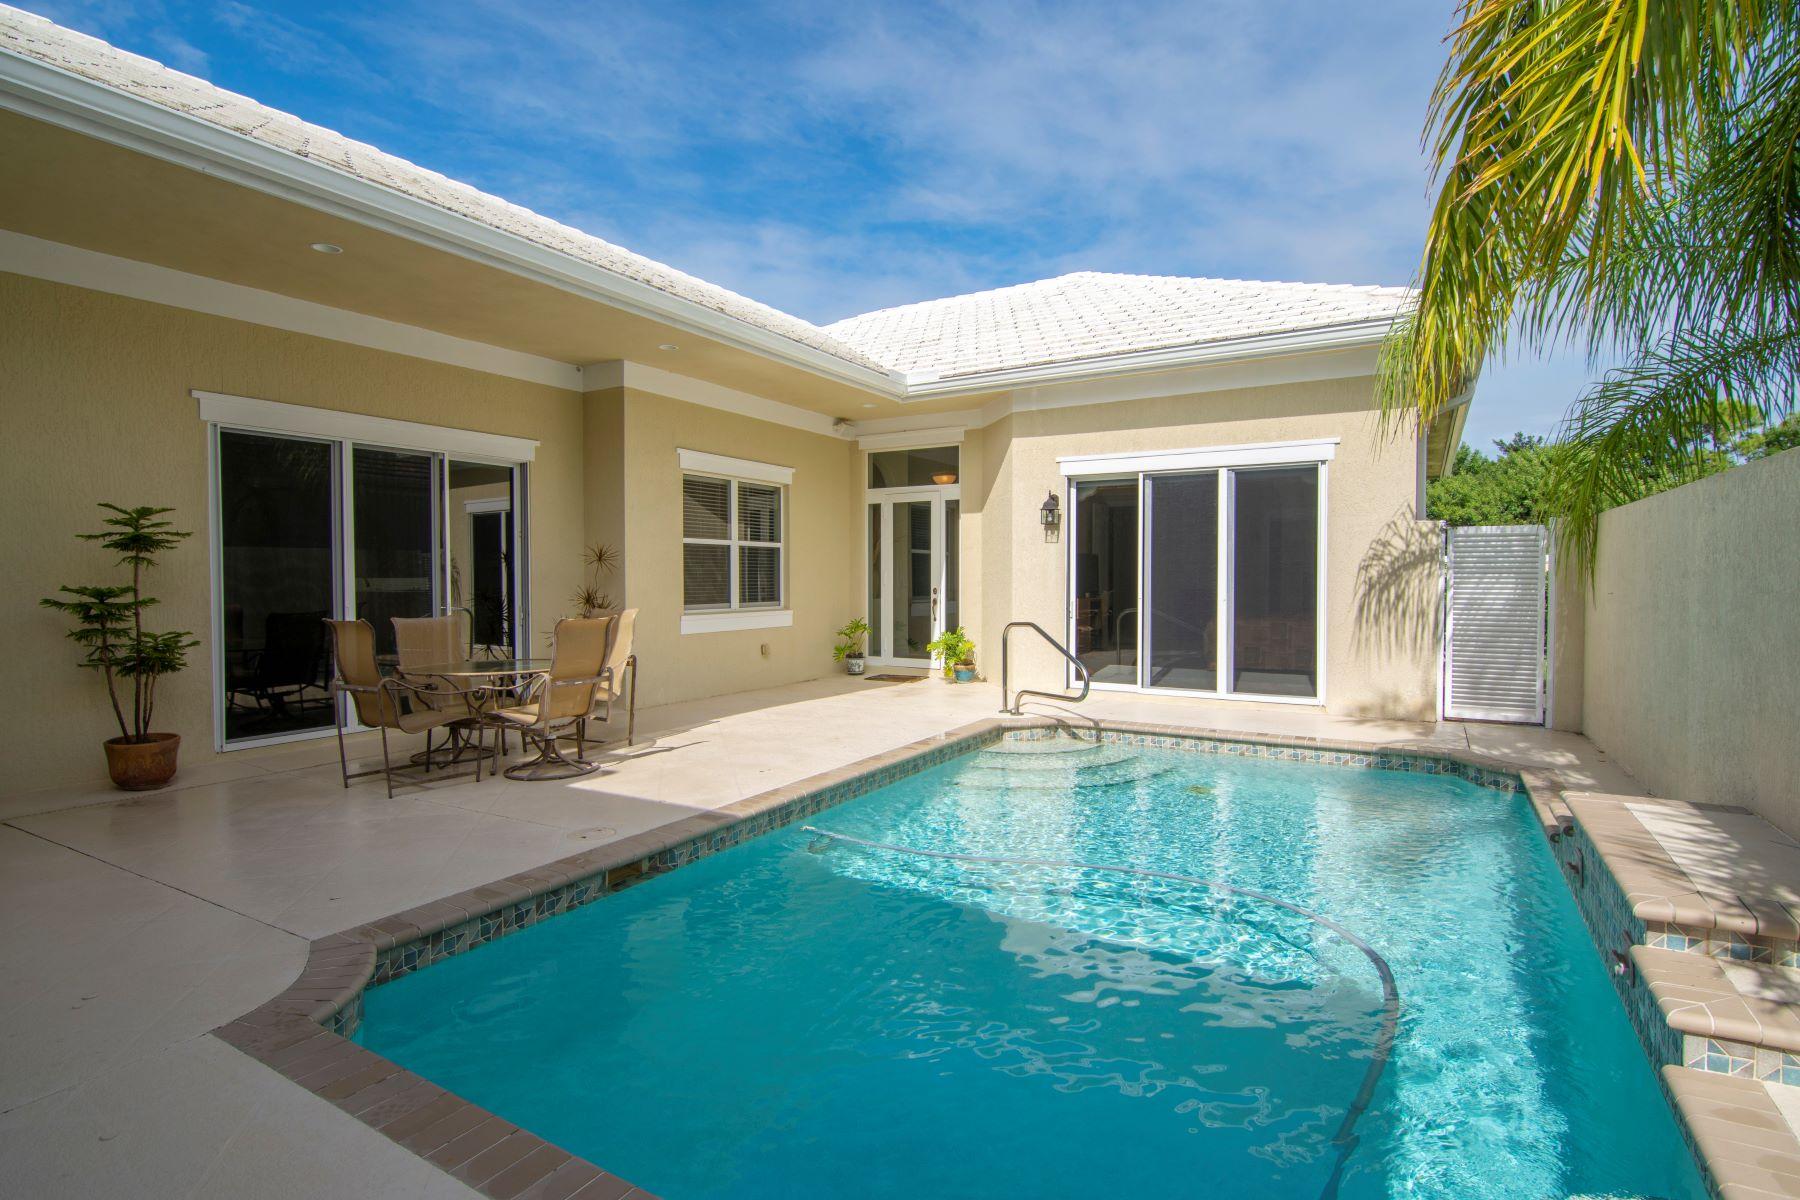 Property vì Bán tại Courtyard Style Home with Generous Space 1025 Riverwind Circle Vero Beach, Florida 32967 Hoa Kỳ